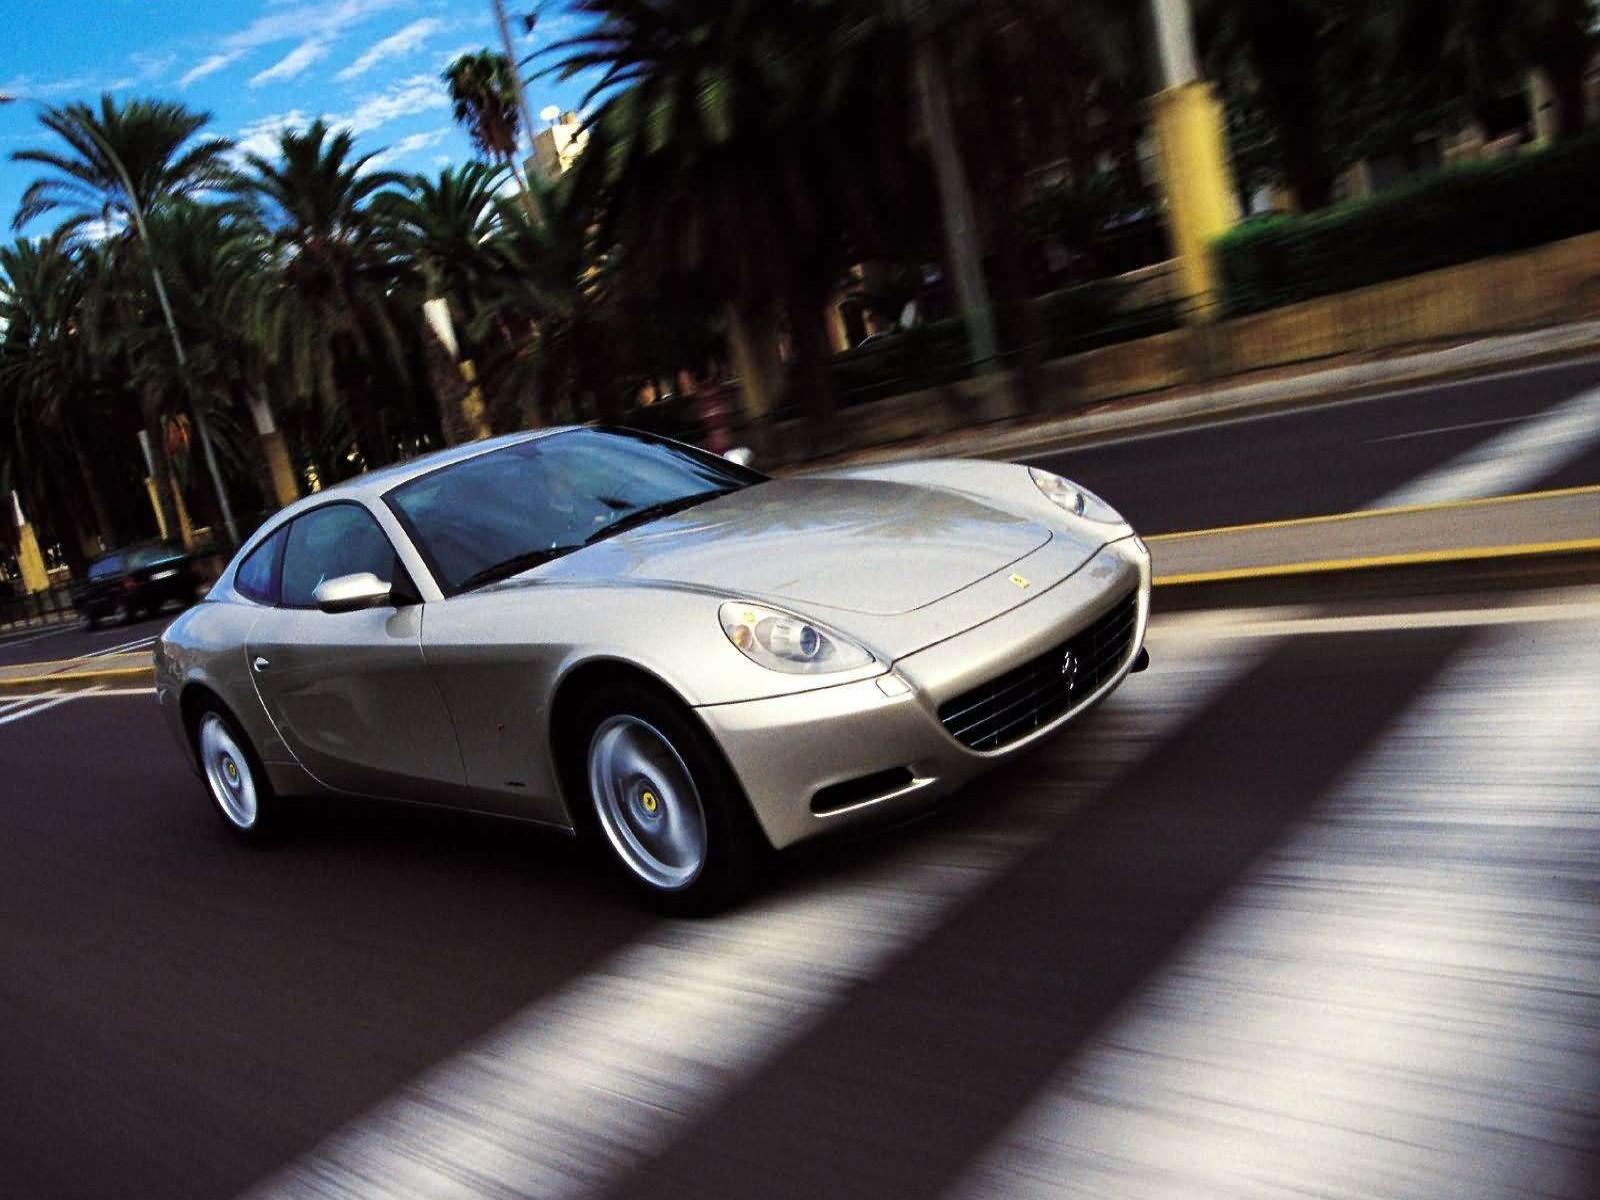 ferrari 612 scaglietti 2004. Cars Review. Best American Auto & Cars Review